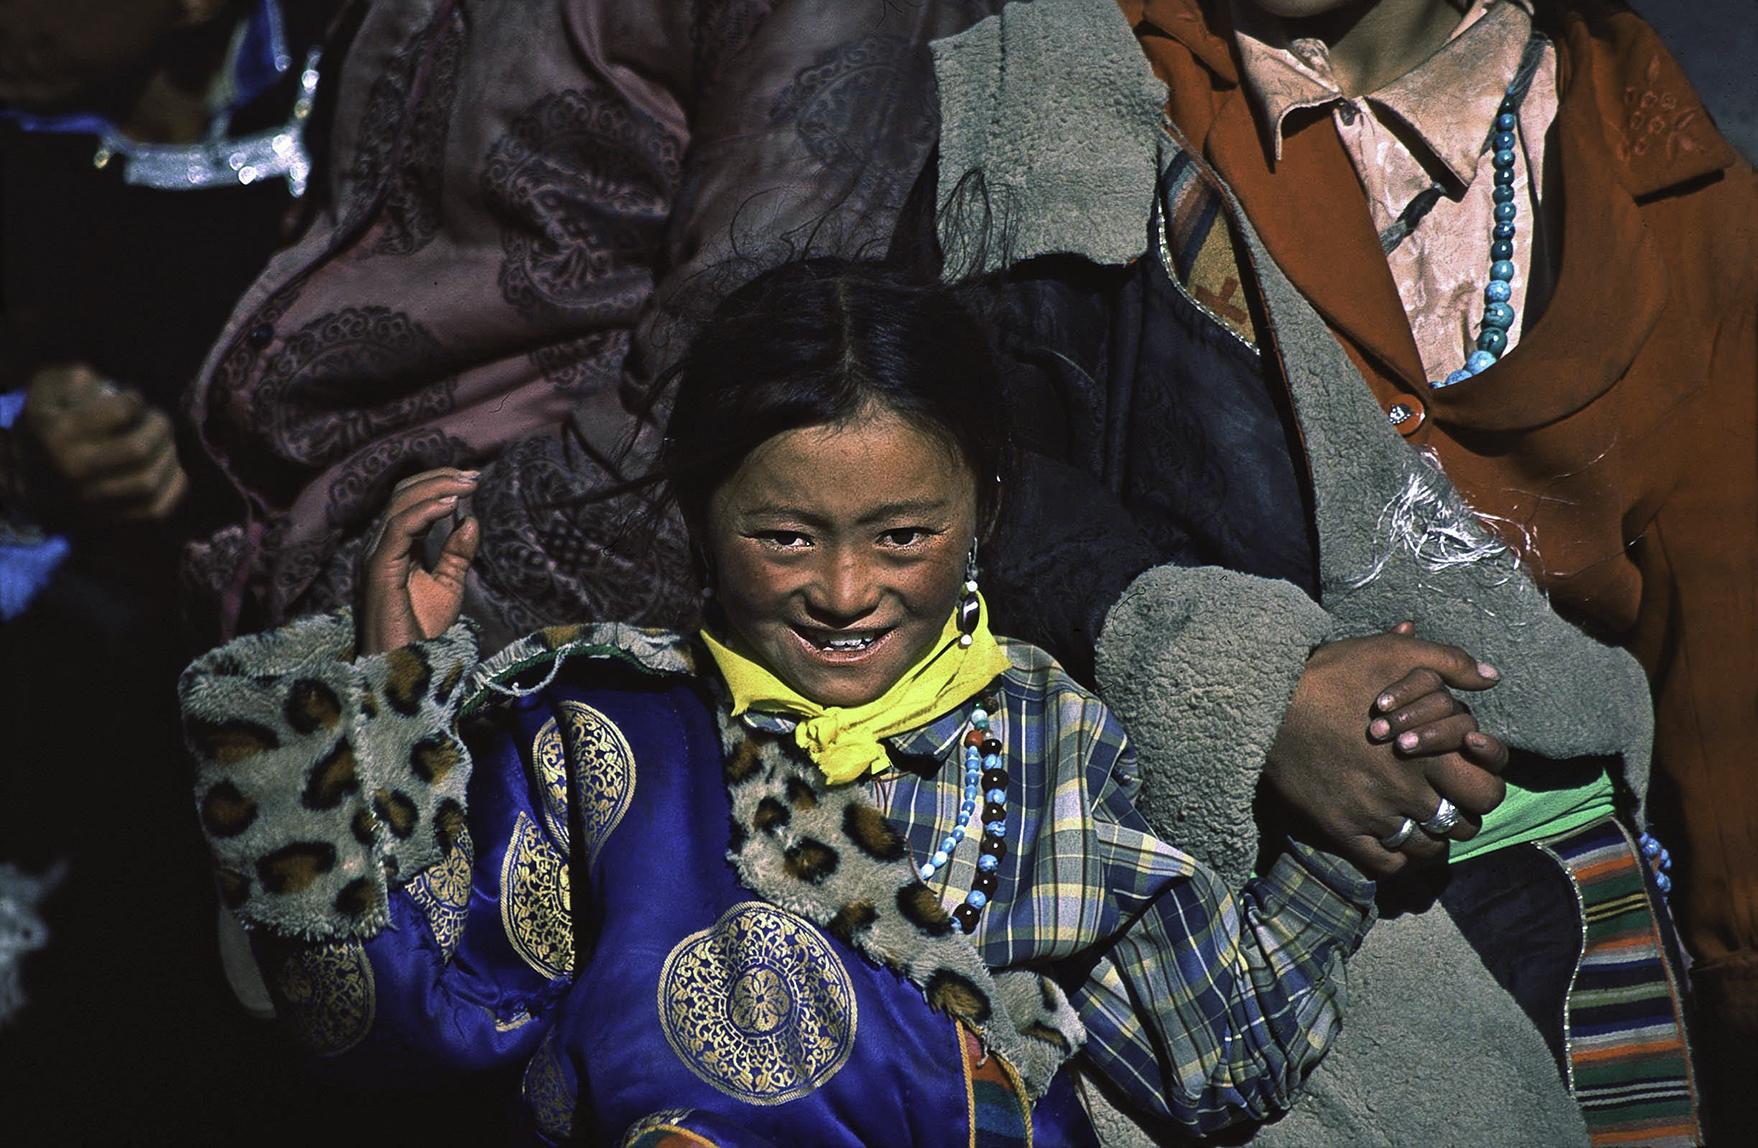 Jokhung Square, Lhasa